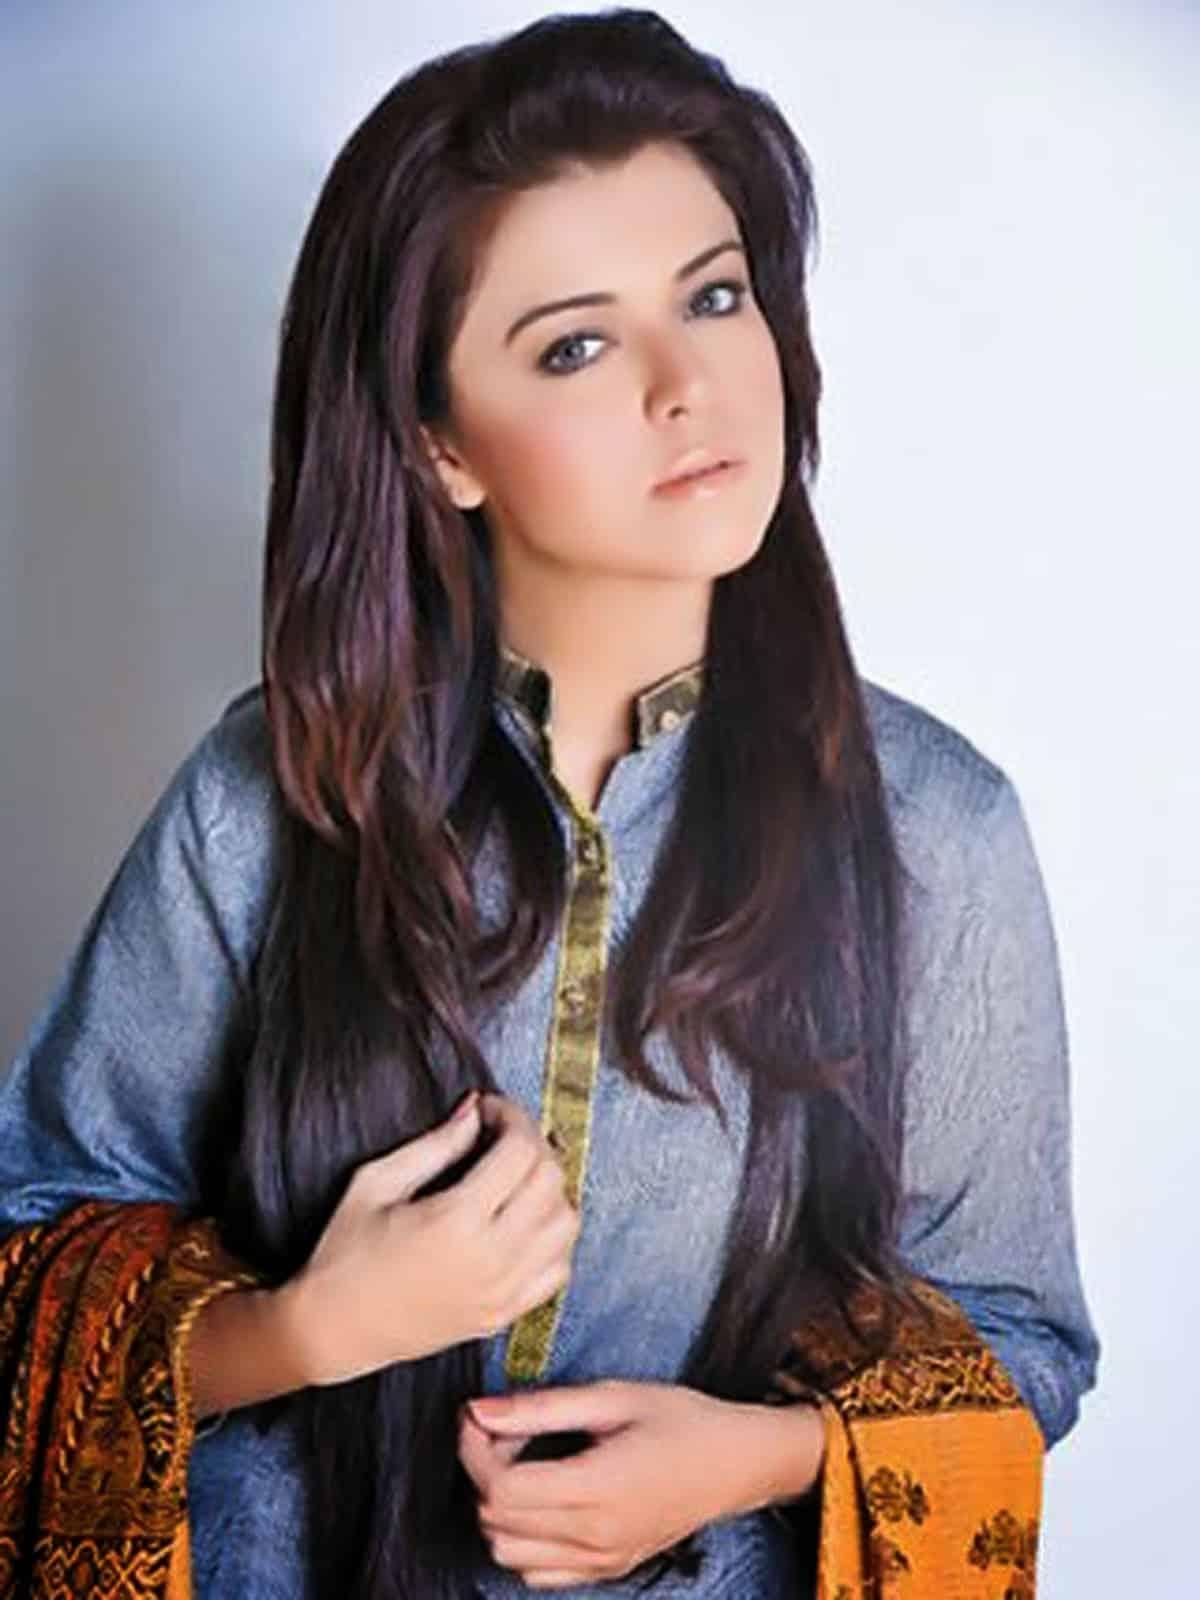 pics Caroline O'Connor (actress)